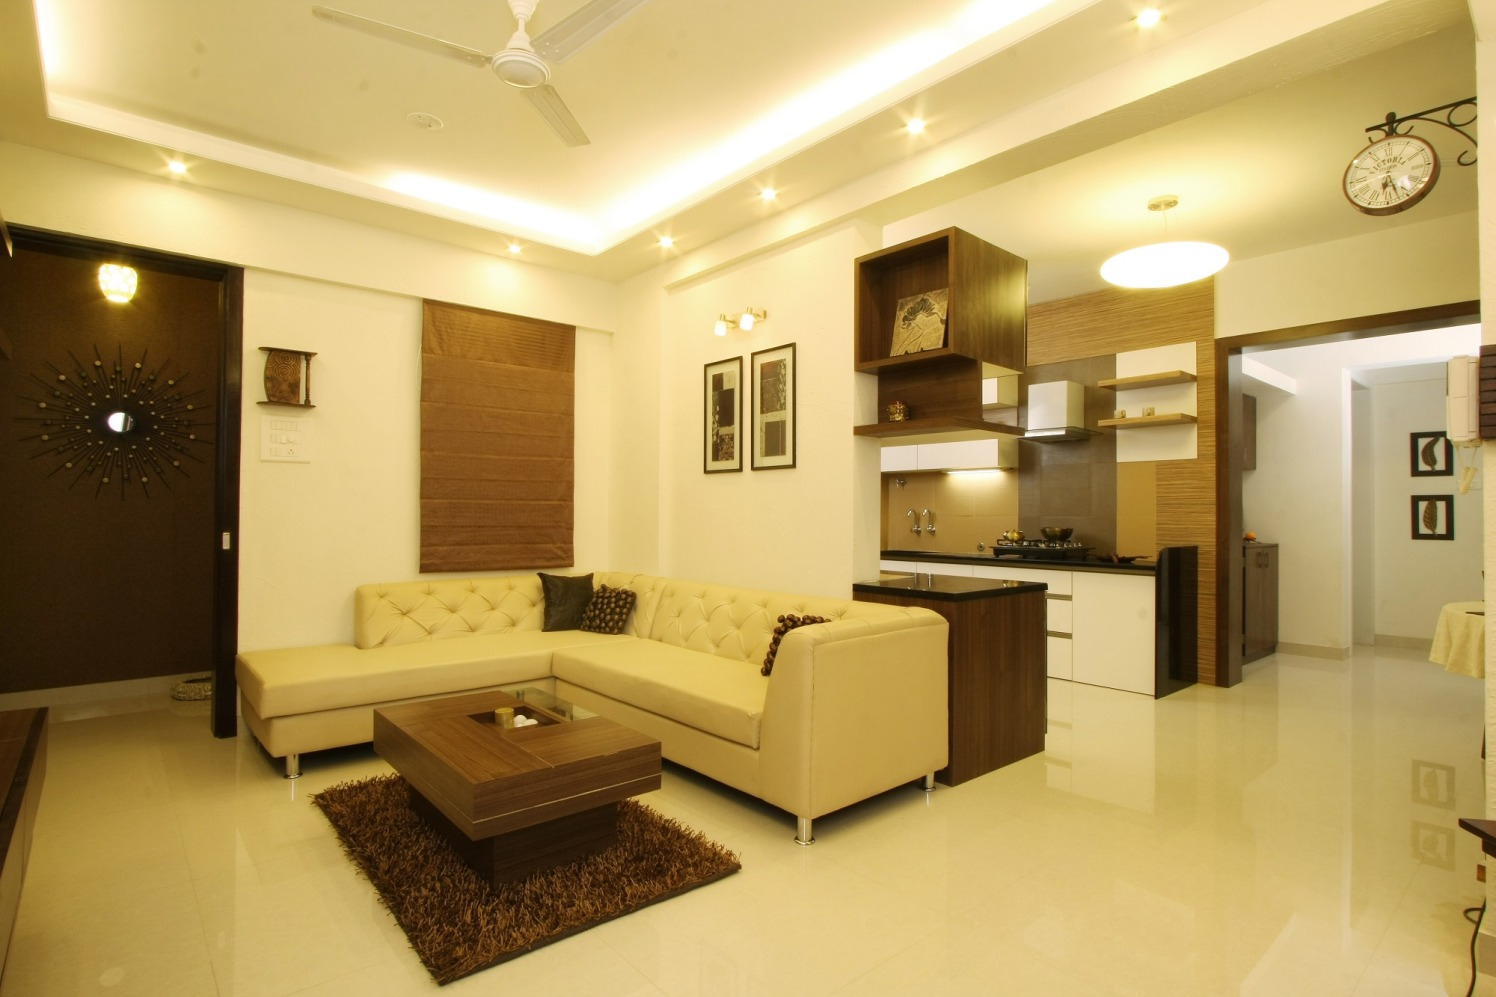 Standard Living by Harshila Shreeram Talasila Modern | Interior Design Photos & Ideas